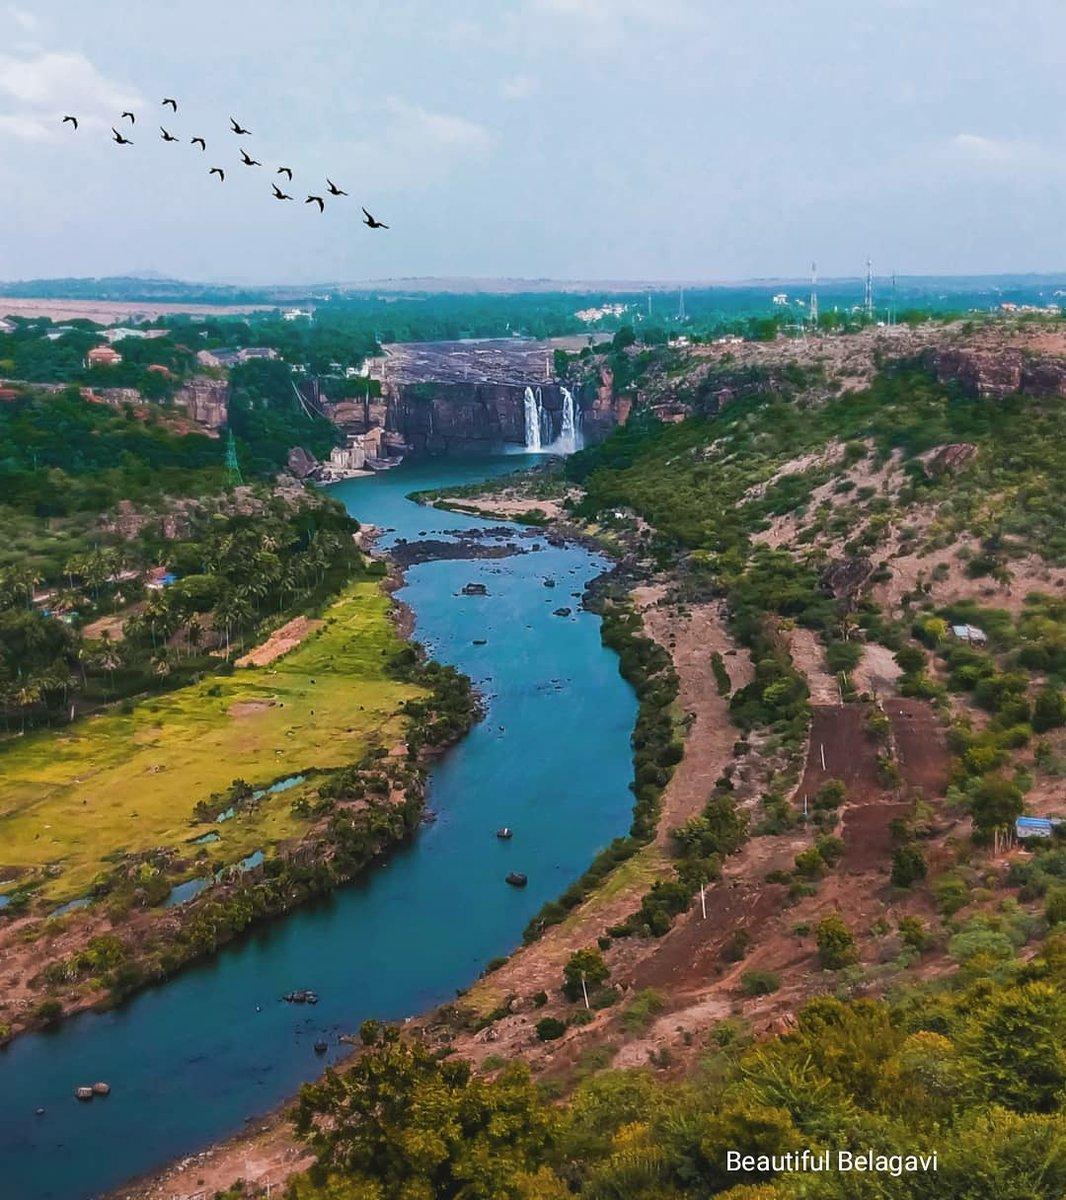 Is this how heaven feels like??? Gokak falls❣️ Pc:Pat's Pratik #beautifulbelagavi #belagavi #karnataka #india #belgaum #nammakarnataka #banglore #mumbai #hubli #pune #kolhapur #smartcity #hubballi #dharwad #goa #banglore #dandeli #karvar #uttarkannada #westernghats https://t.co/QaLDDszj42